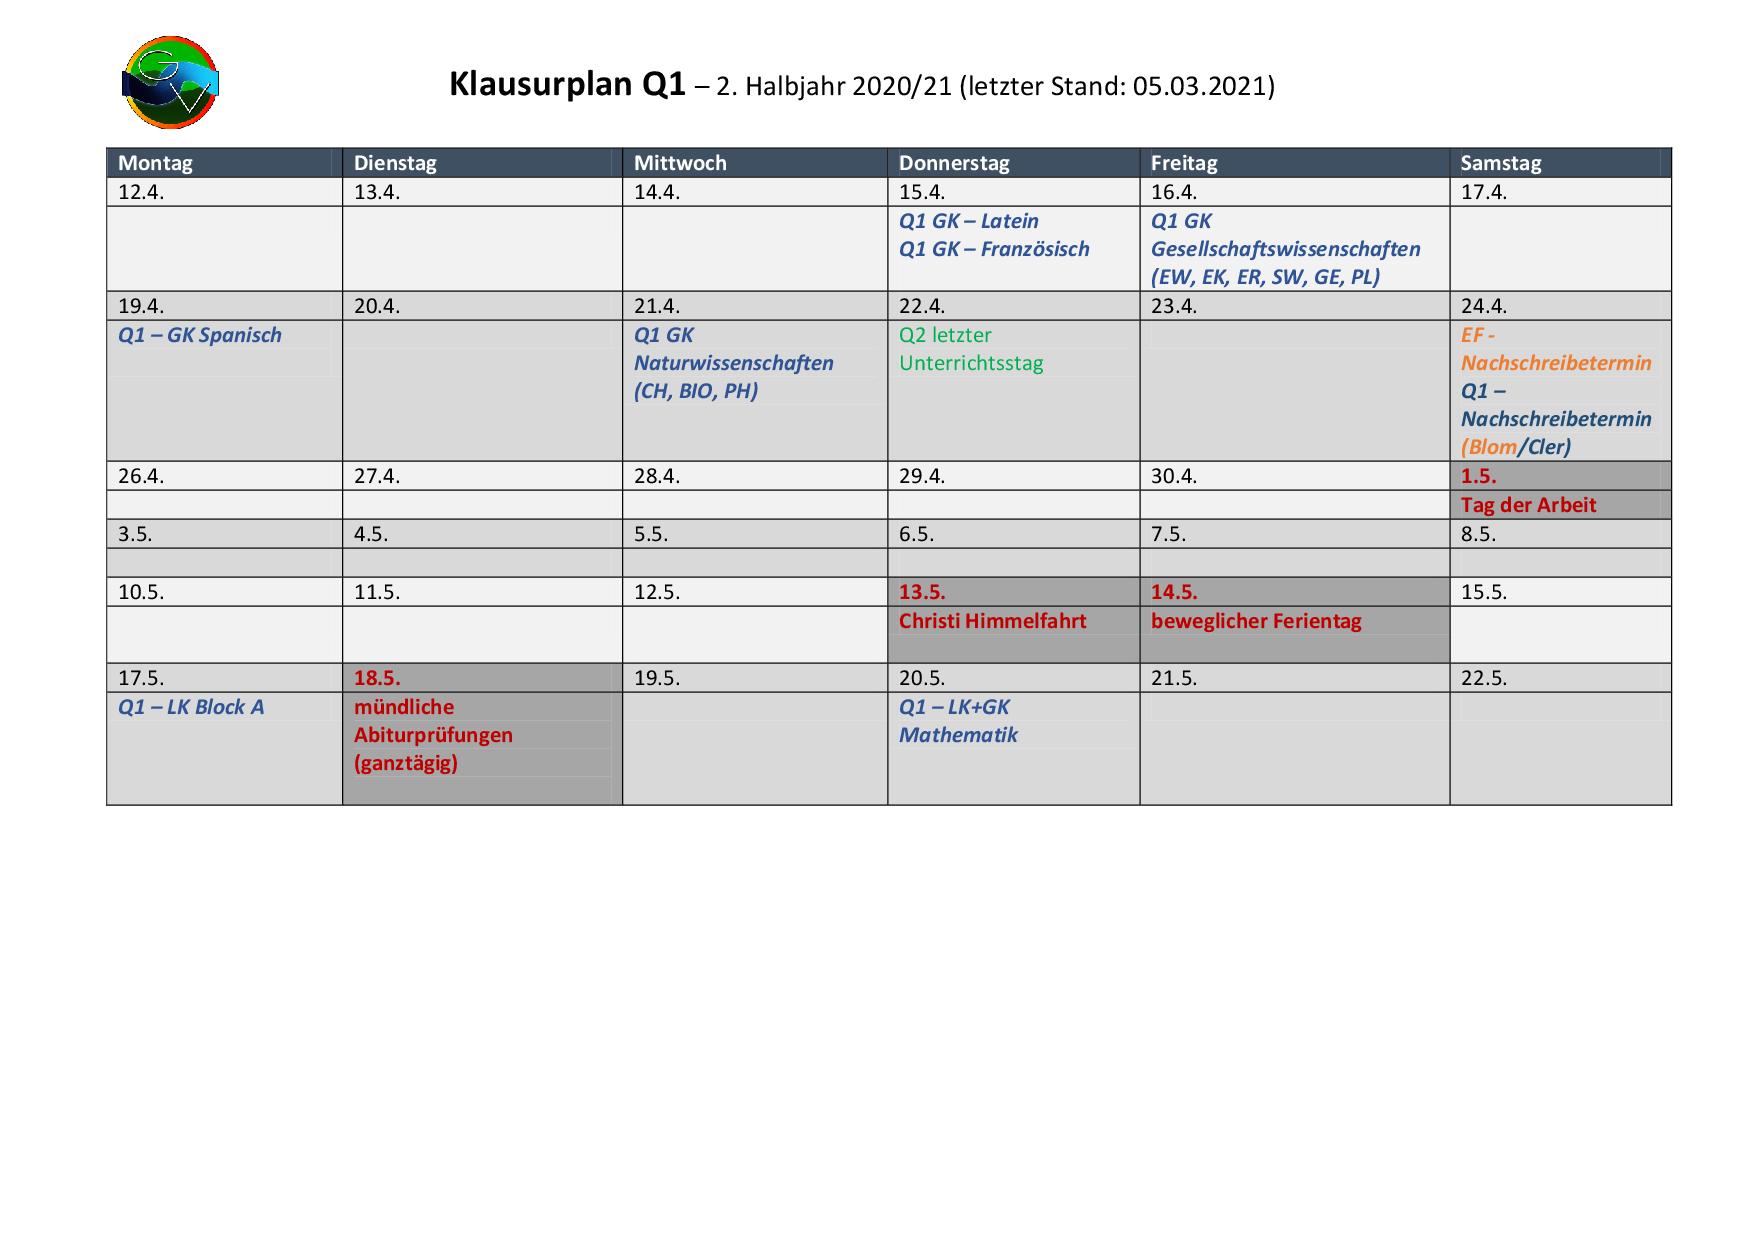 2021-03-05_Klausurplan-Q1-2HJ-4-002